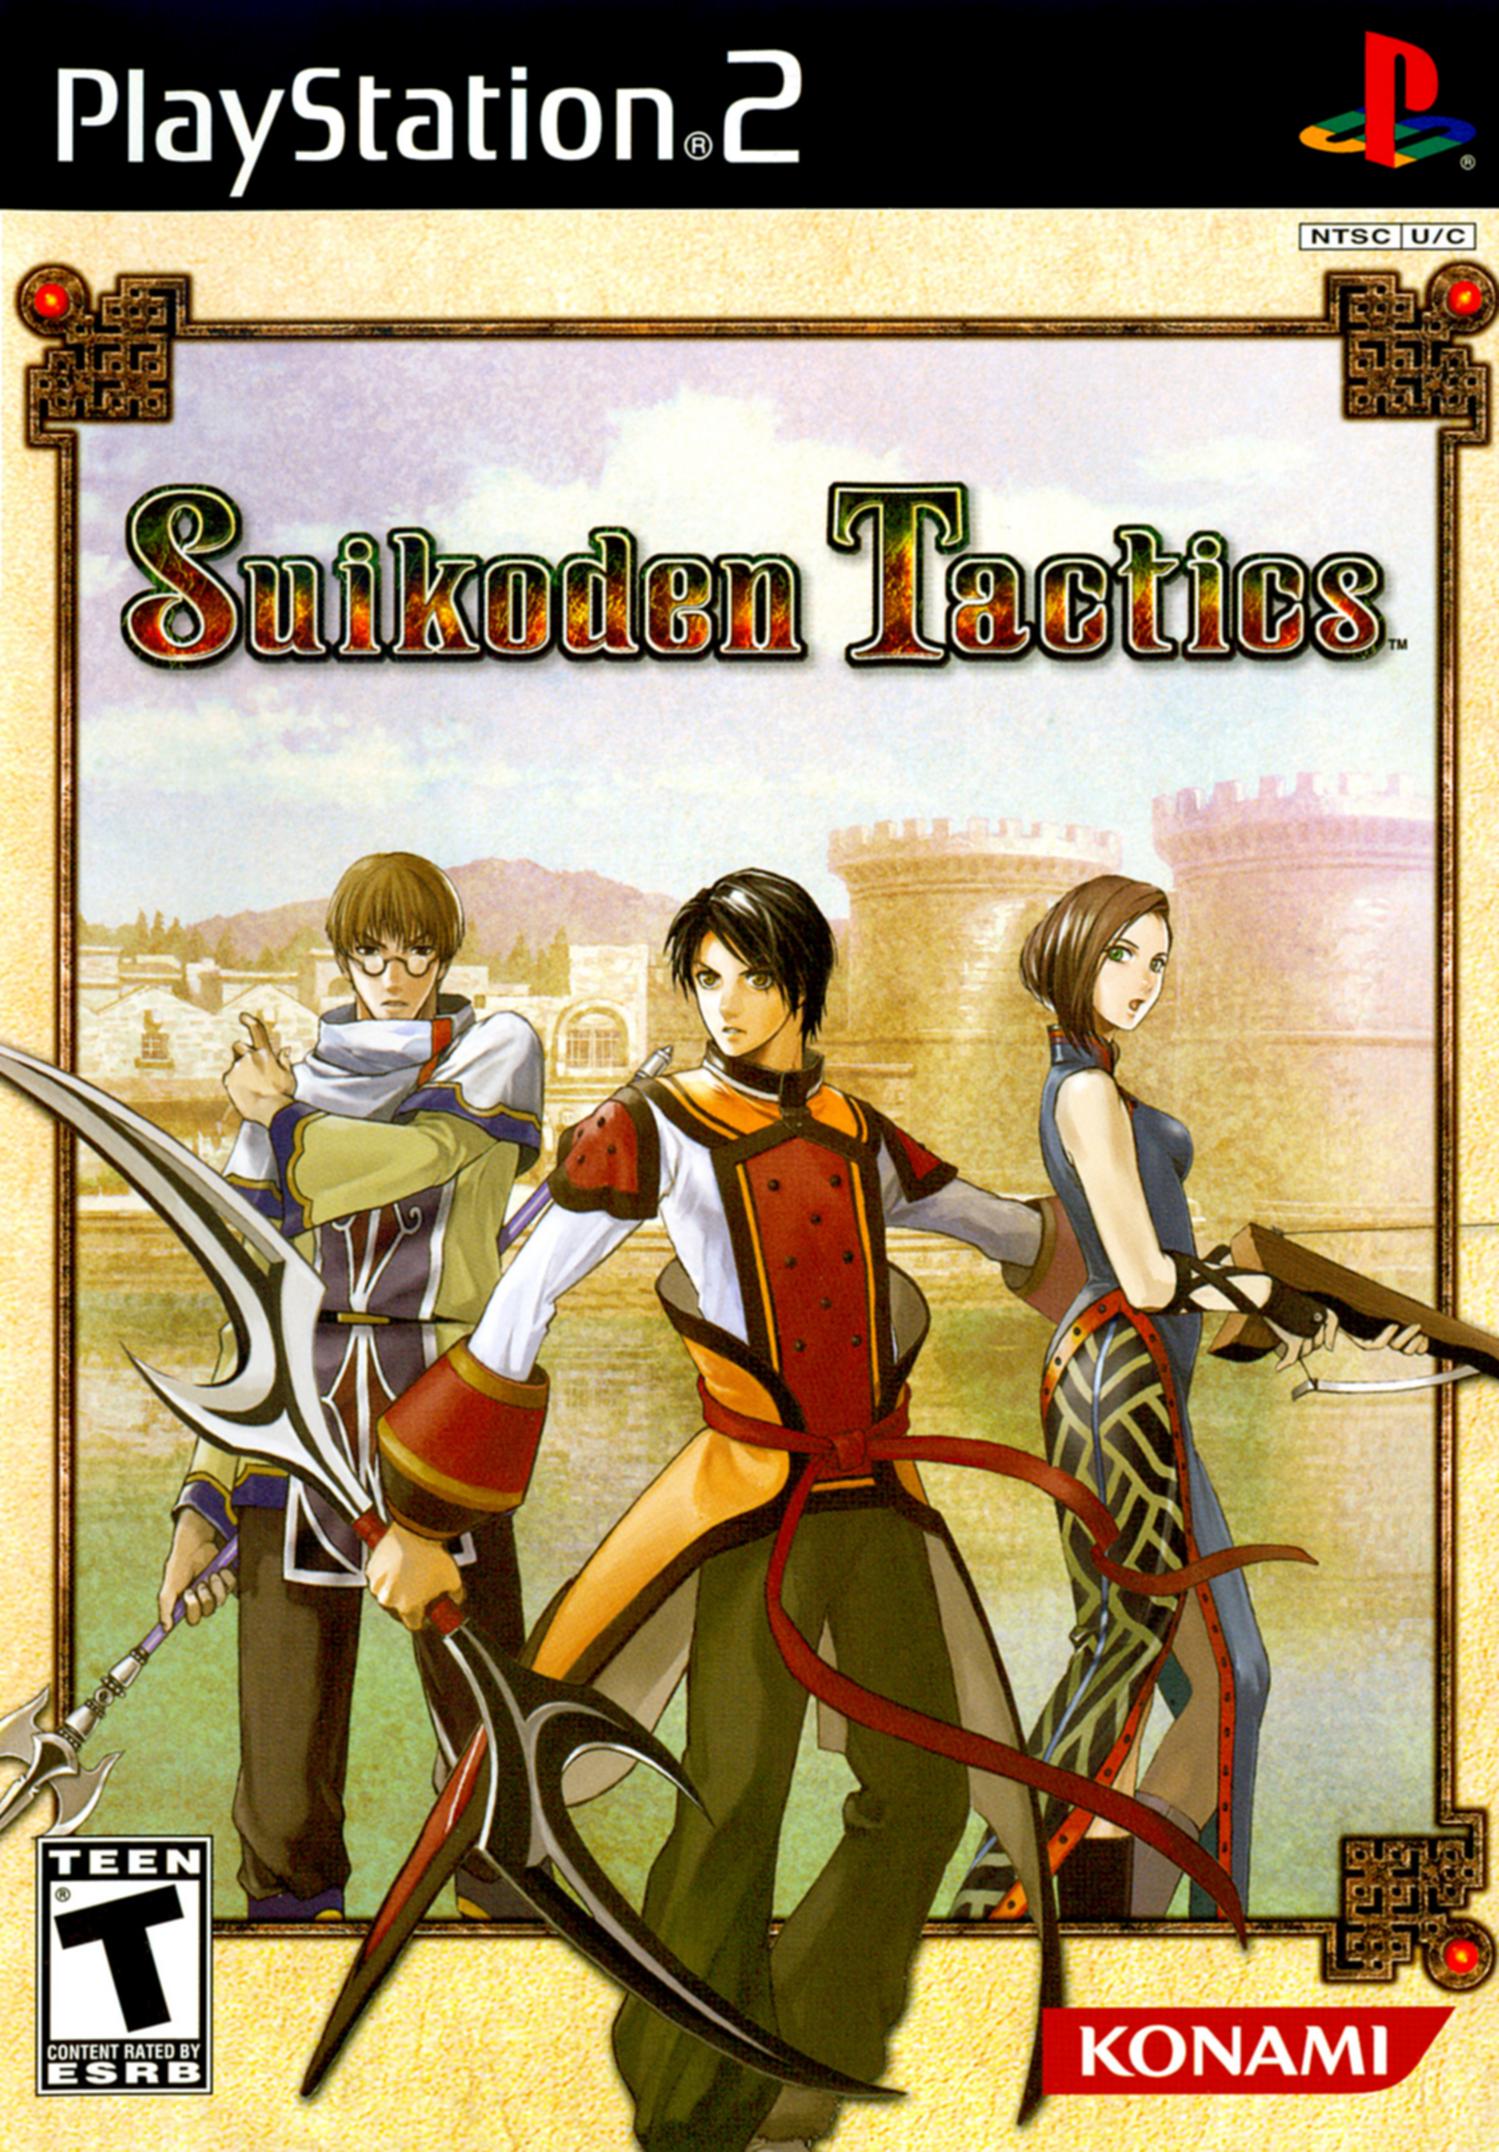 Download Save Game Suikoden 1